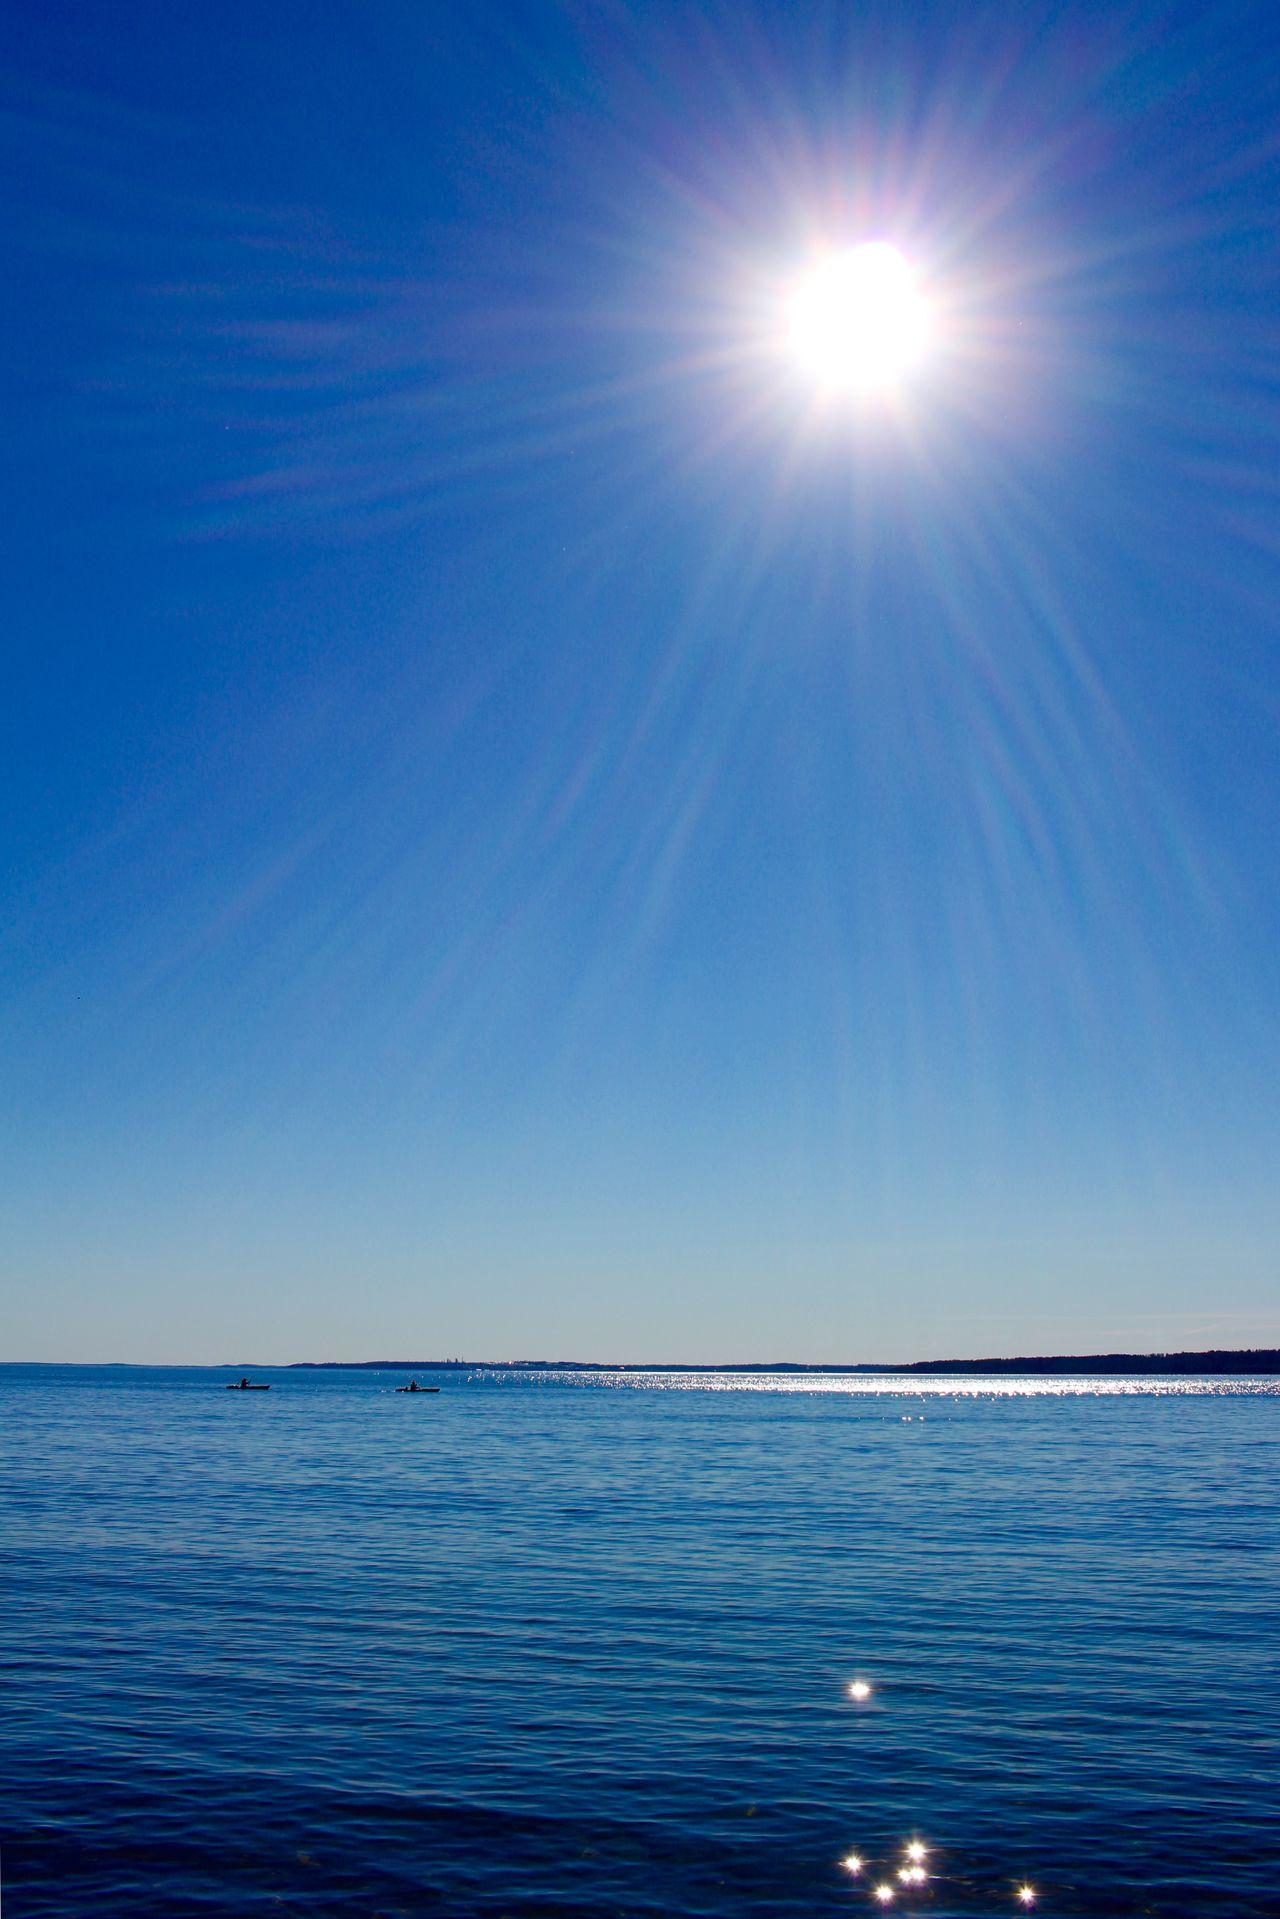 Showcase March Clear Blue Sky Clear Sky Blue Sky Sun Sunlight ☀ Sunlight Sunny Day Sunny Sunnyday Sunny☀ Sunnyday☀️ Sunnydays Sunny Day☀ Sunny Day❤ Ocean❤ Beach Padling Padlers Paddle Paddling Reflection Reflections Blue Wave Blue Wave 💙 The Great Outdoors - 2017 EyeEm Awards